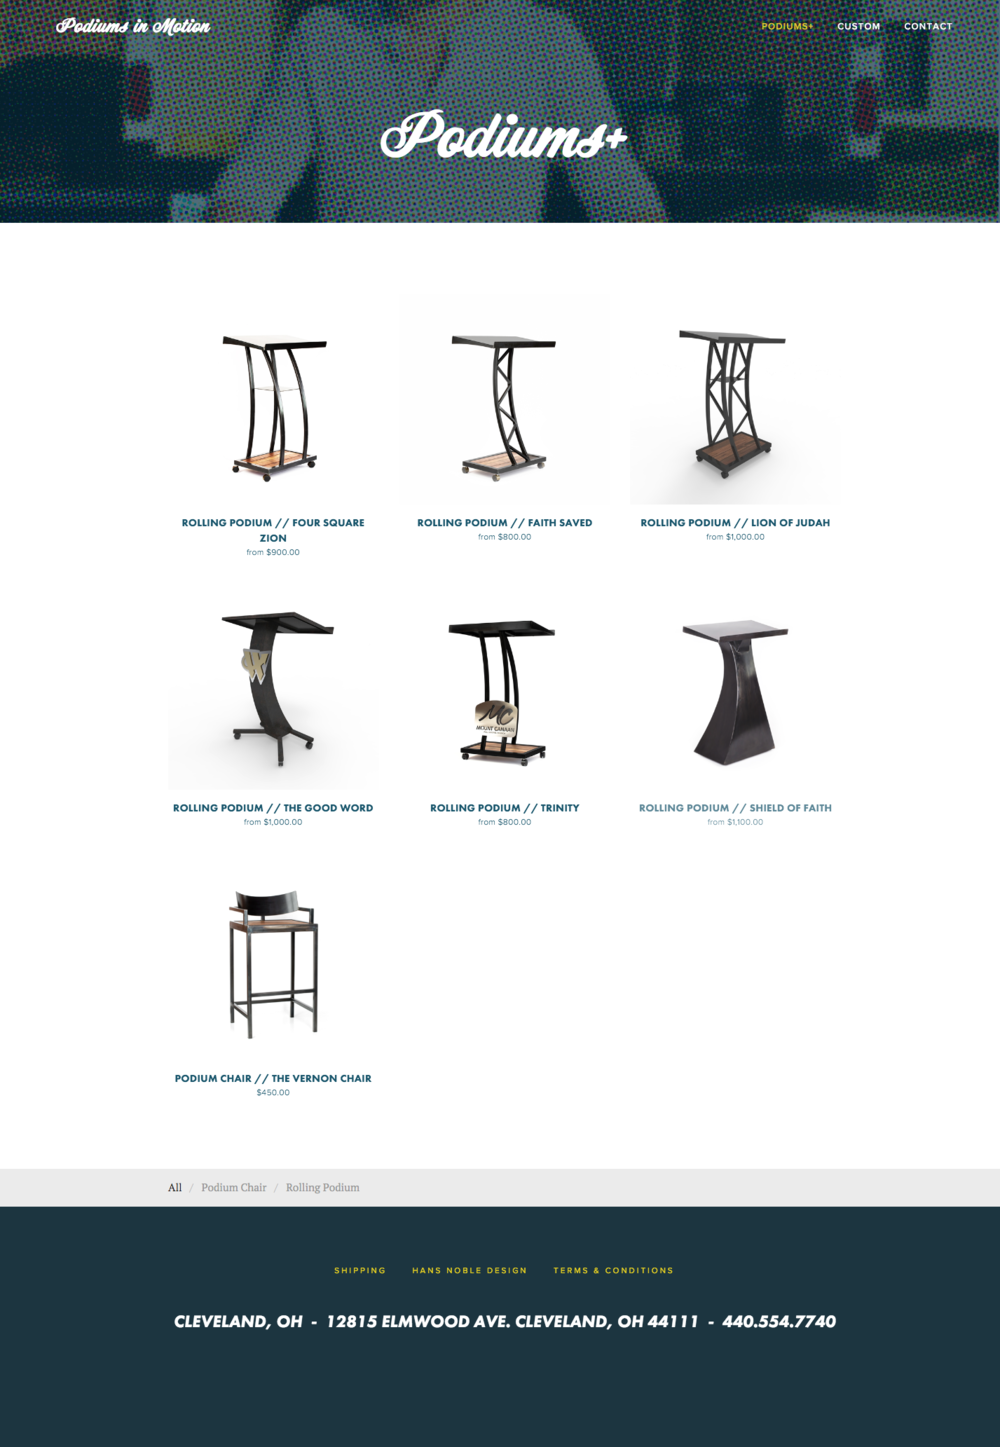 screenshot-podiumsinmotion.com 2016-03-11 22-42-43.png